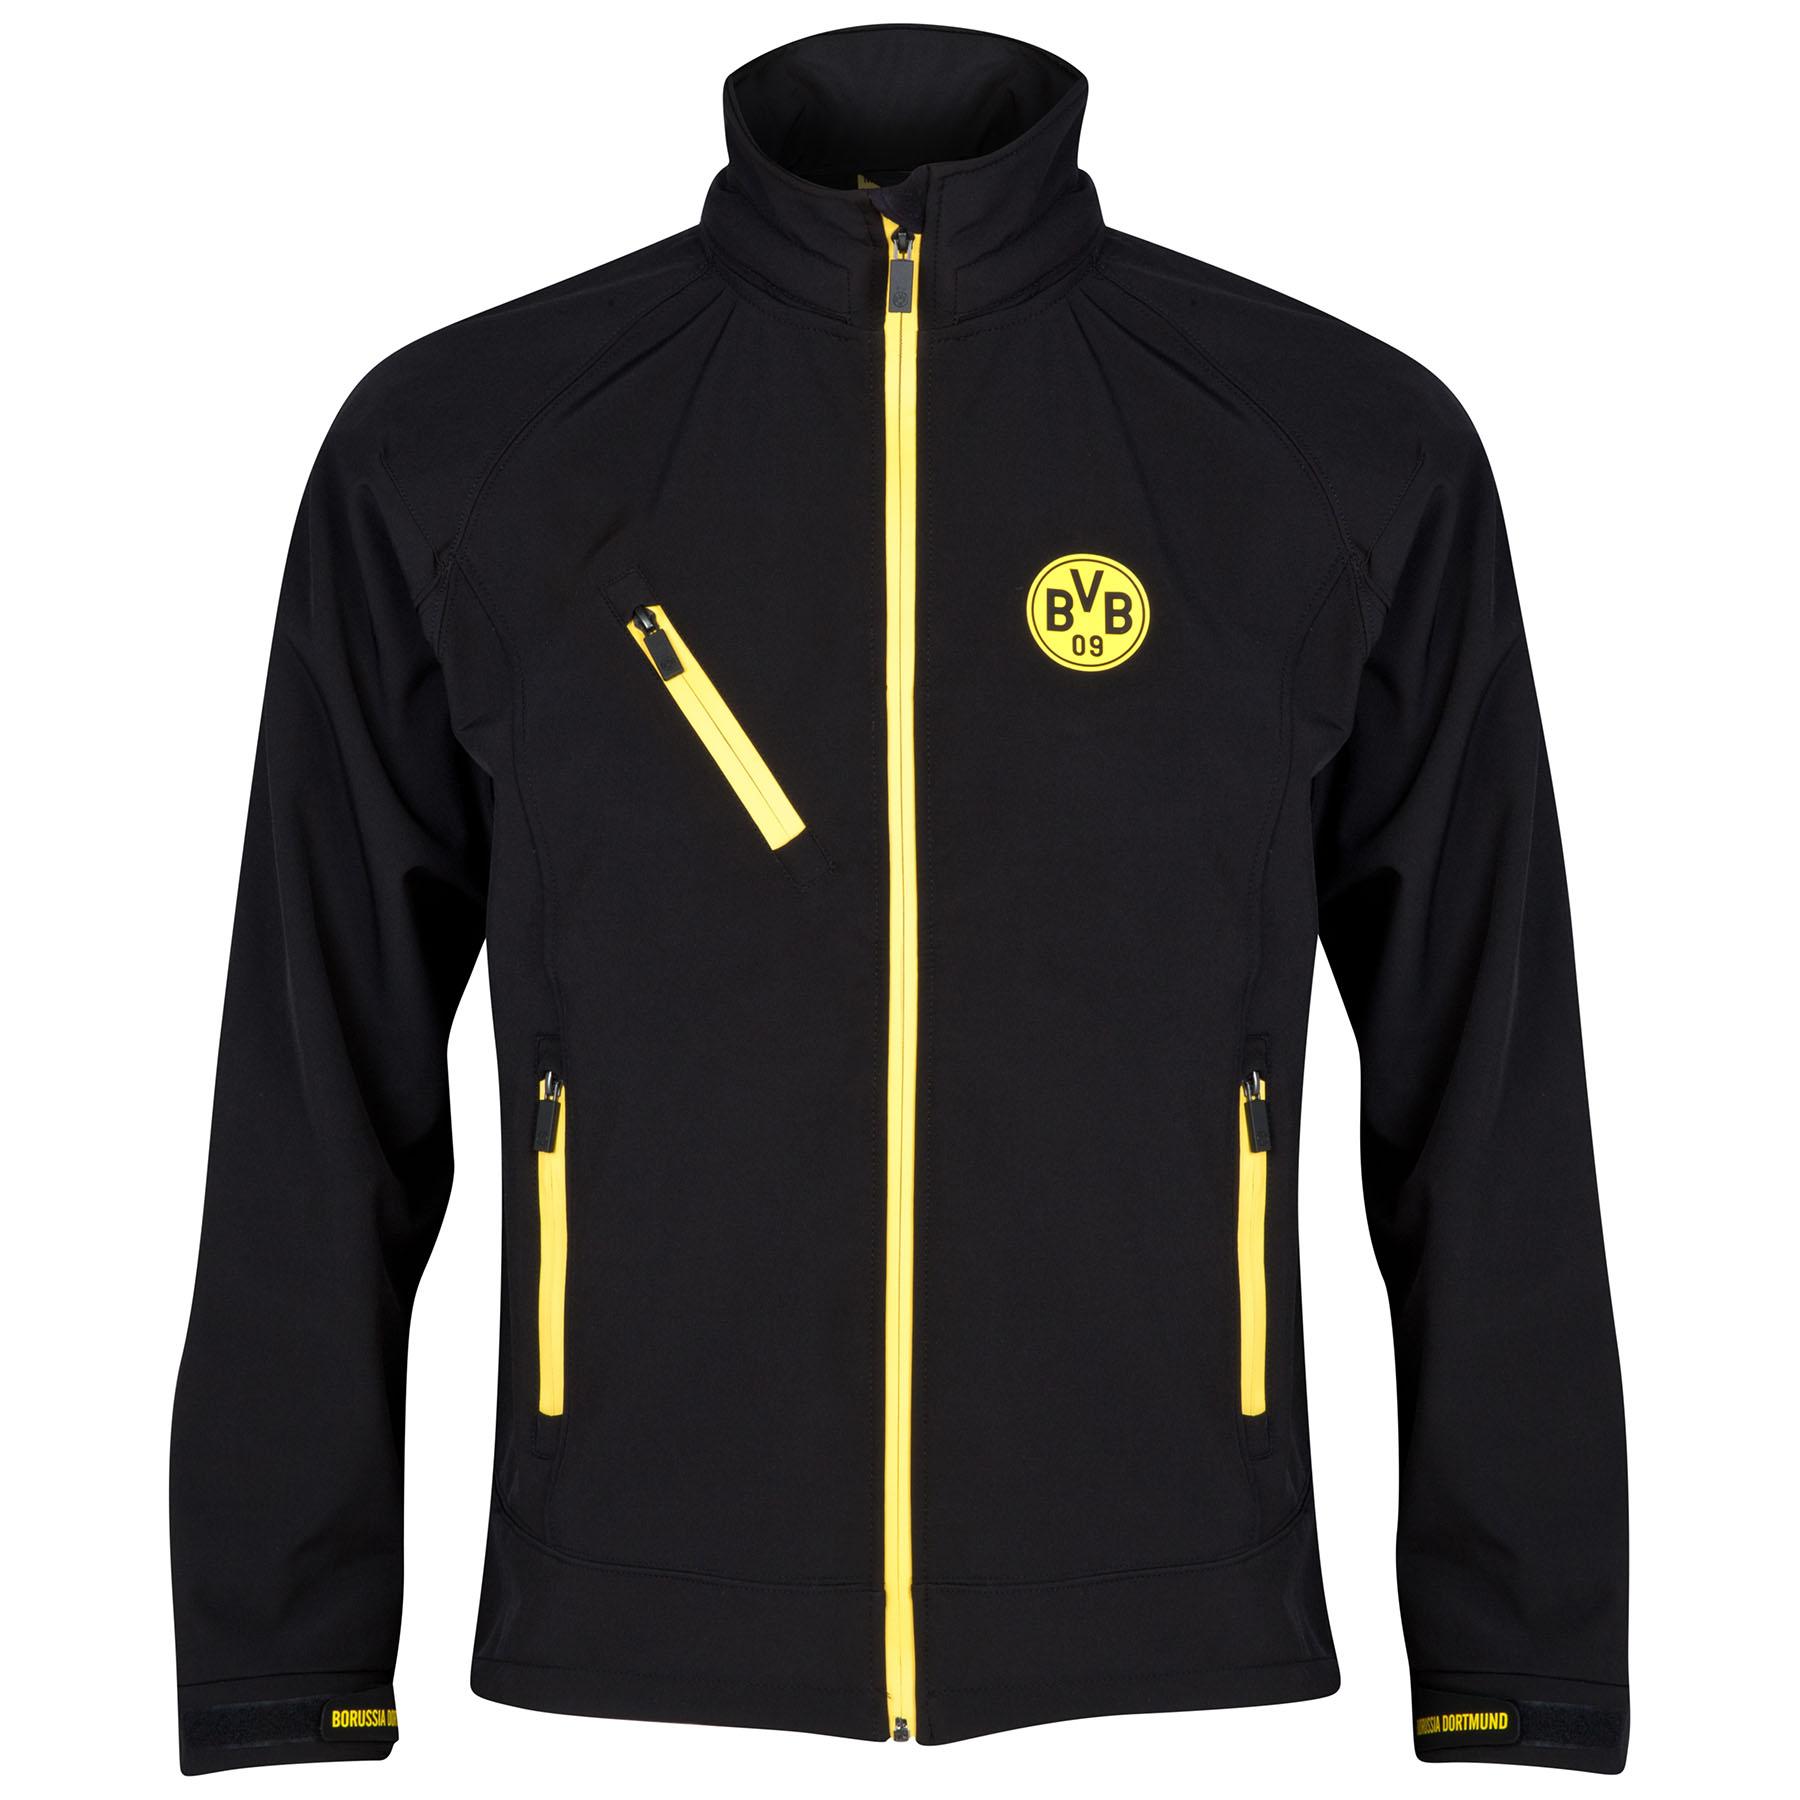 BVB Soft Shell Jacket - Black